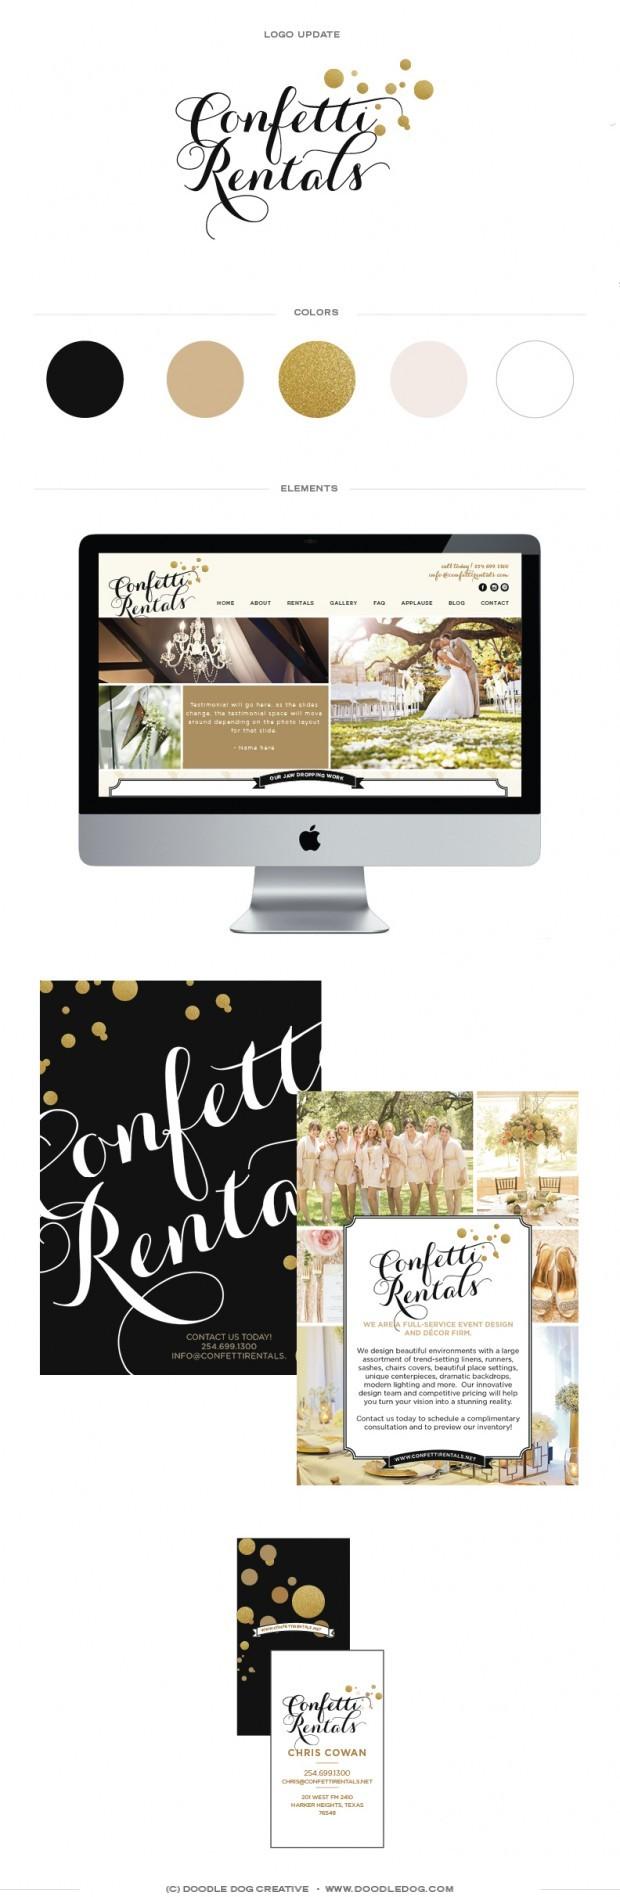 black and gold brand identity, gold glitter brand, wedding business brand, custom website design in wordpress